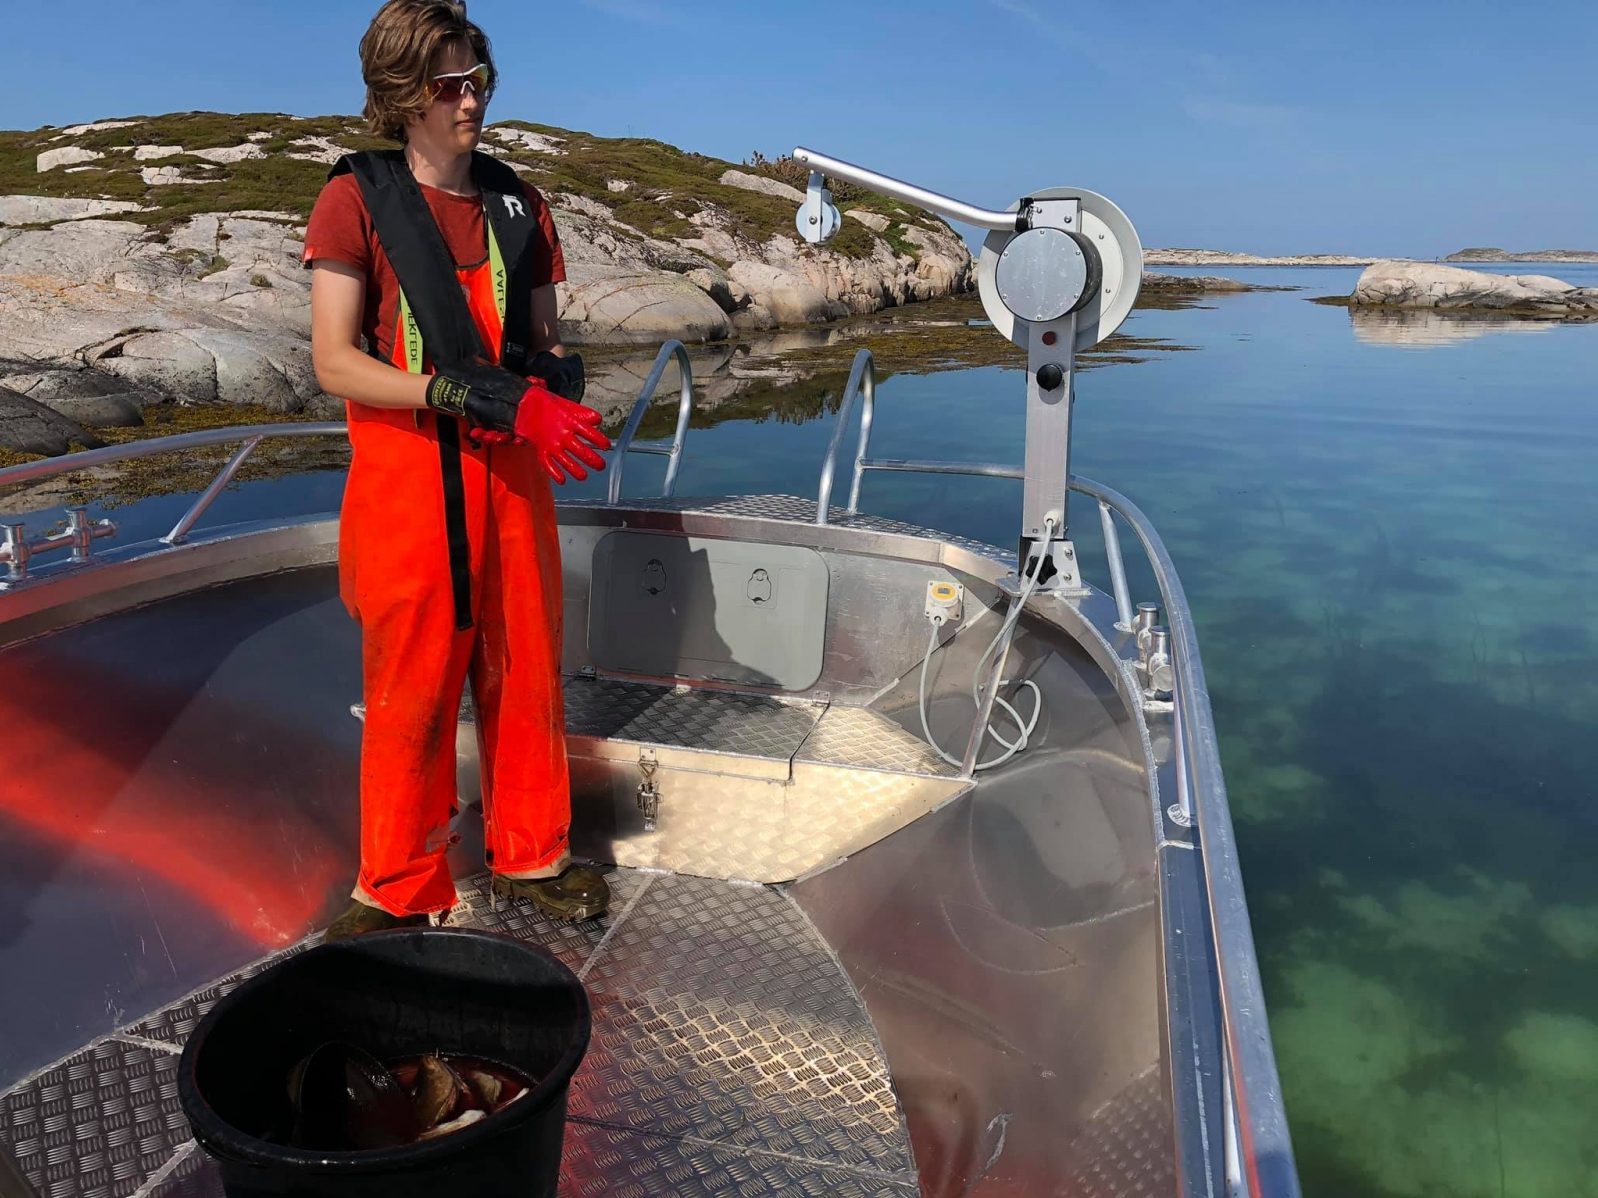 Øyhopping og fiskeopplevelser på Bogøya i Frøyas skjærgård på Trøndelagskysten.